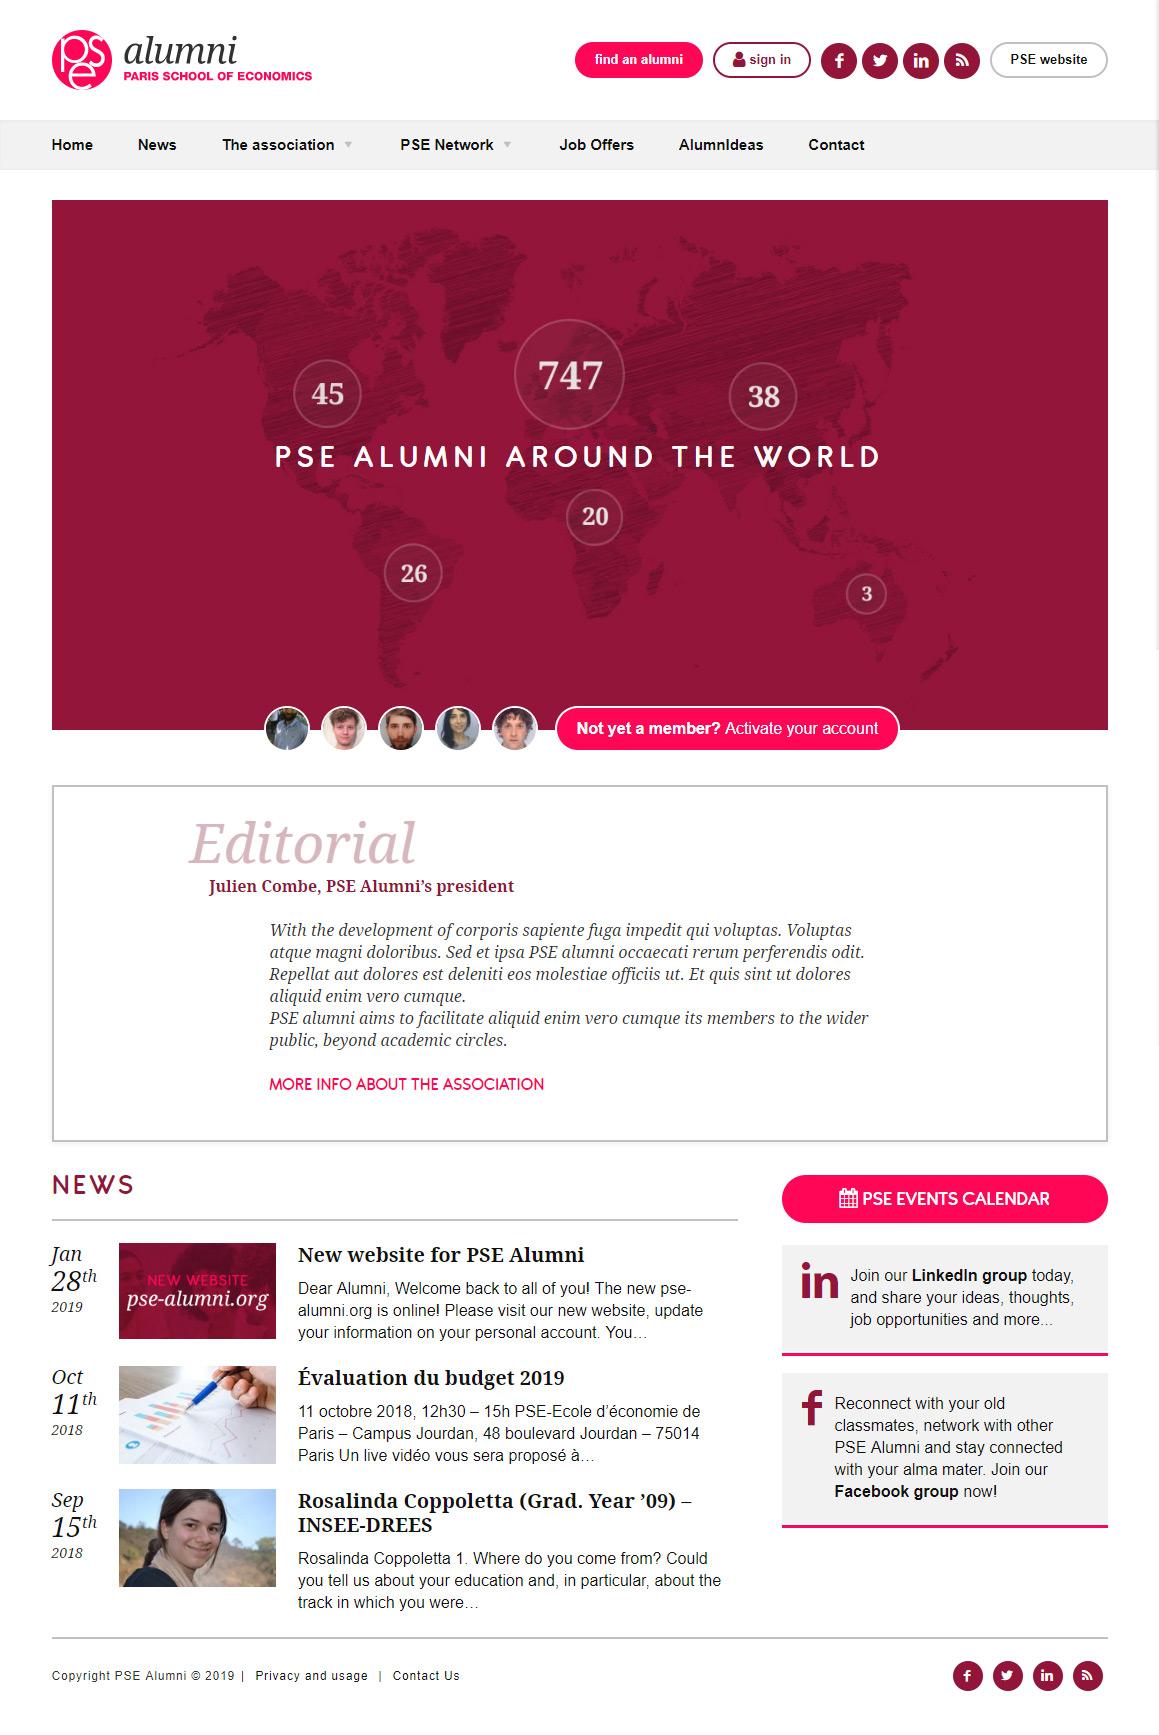 PSE Alumni homepage